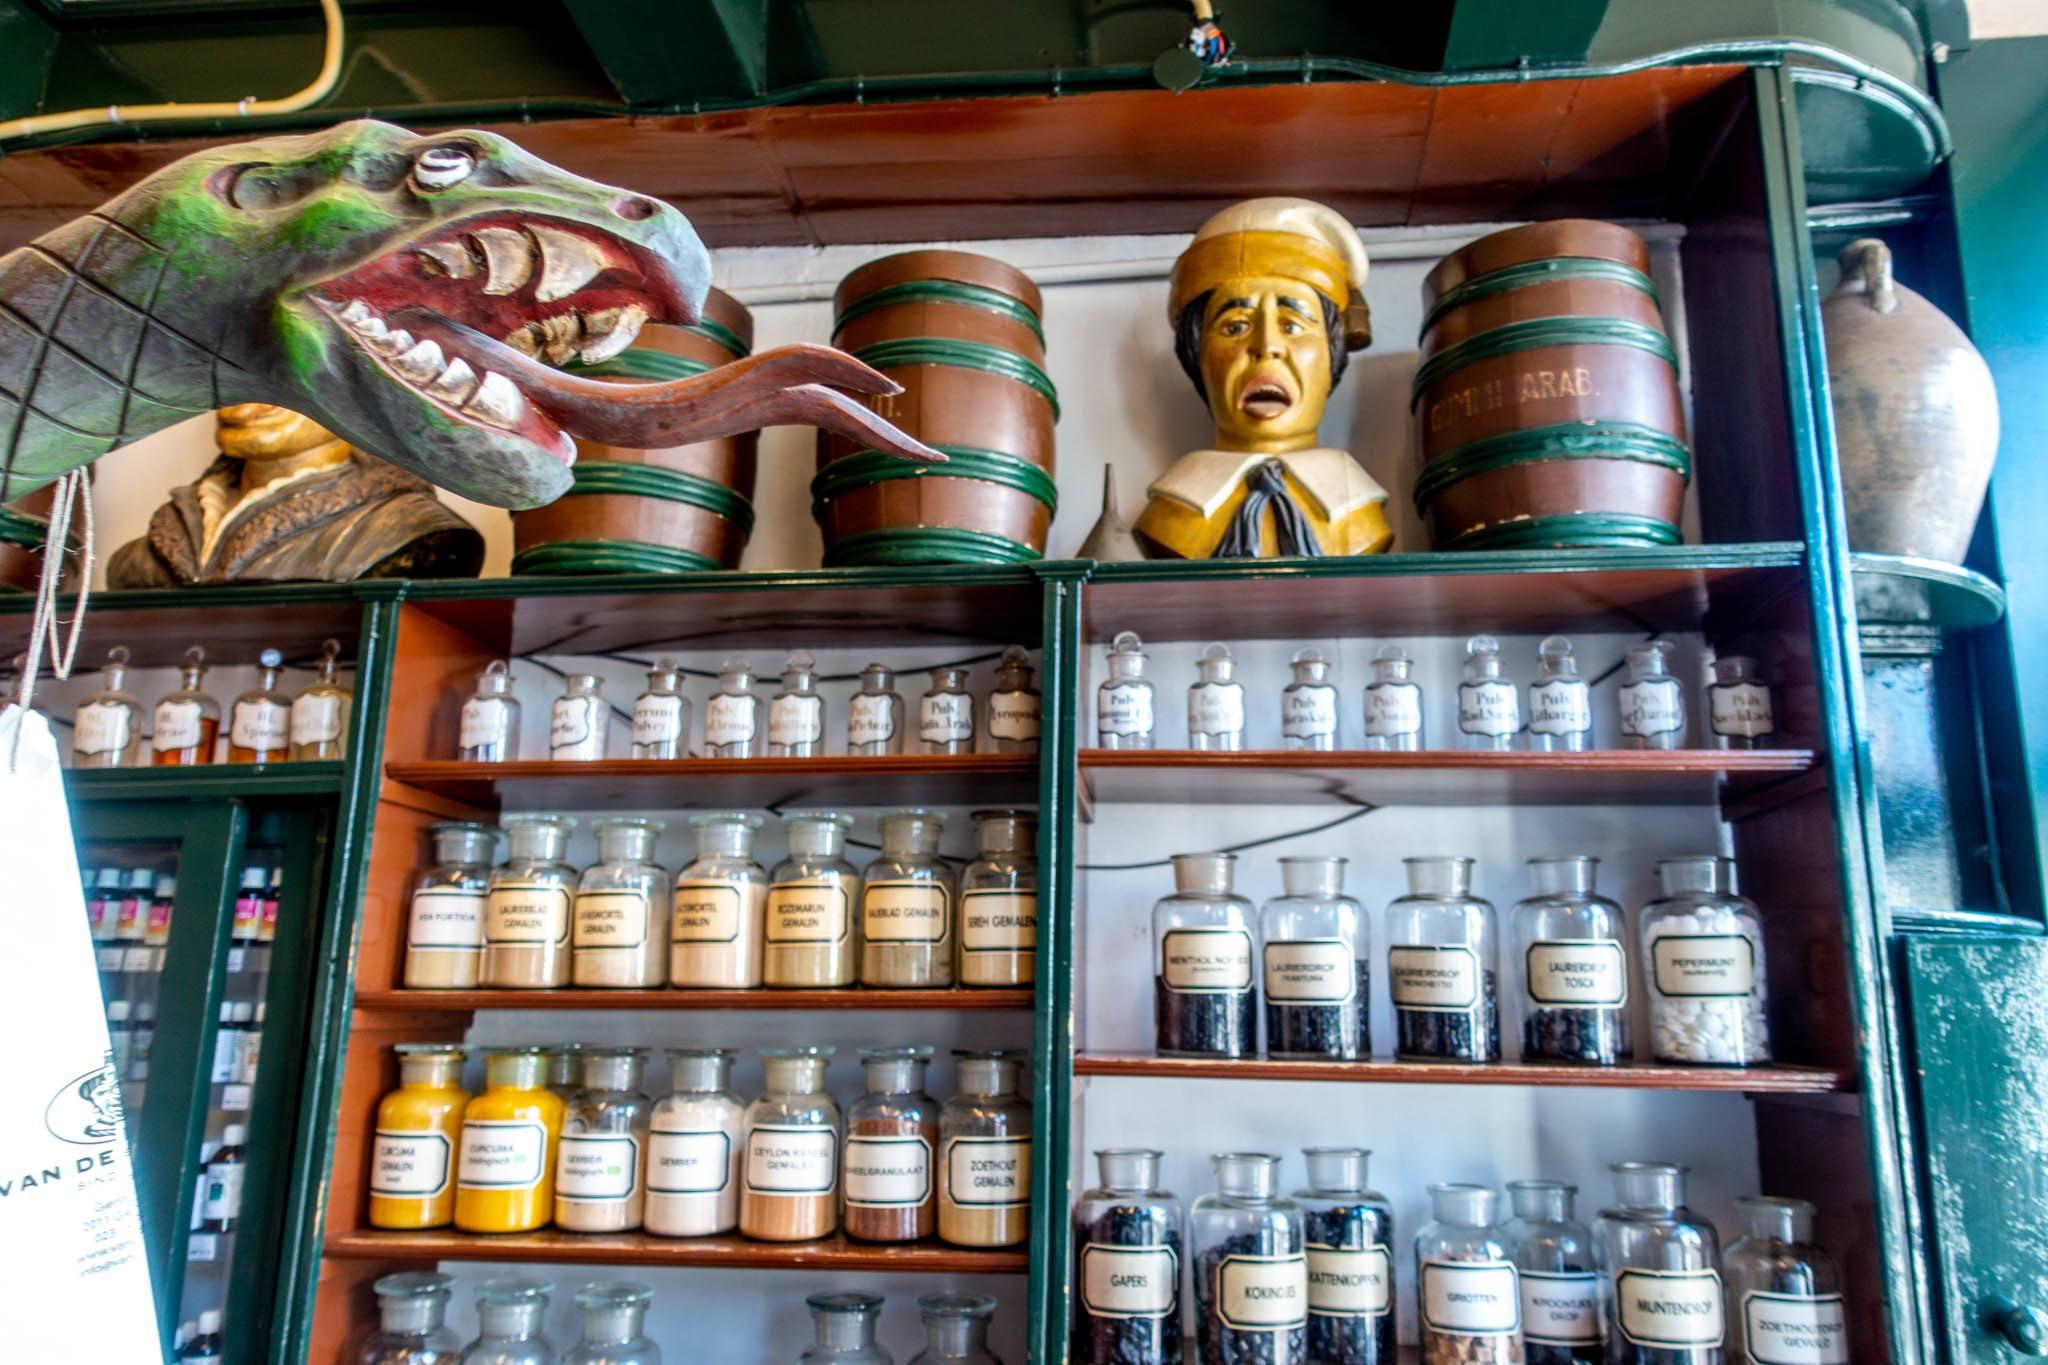 Apothecary bottles on shelves inside old-time pharmacy